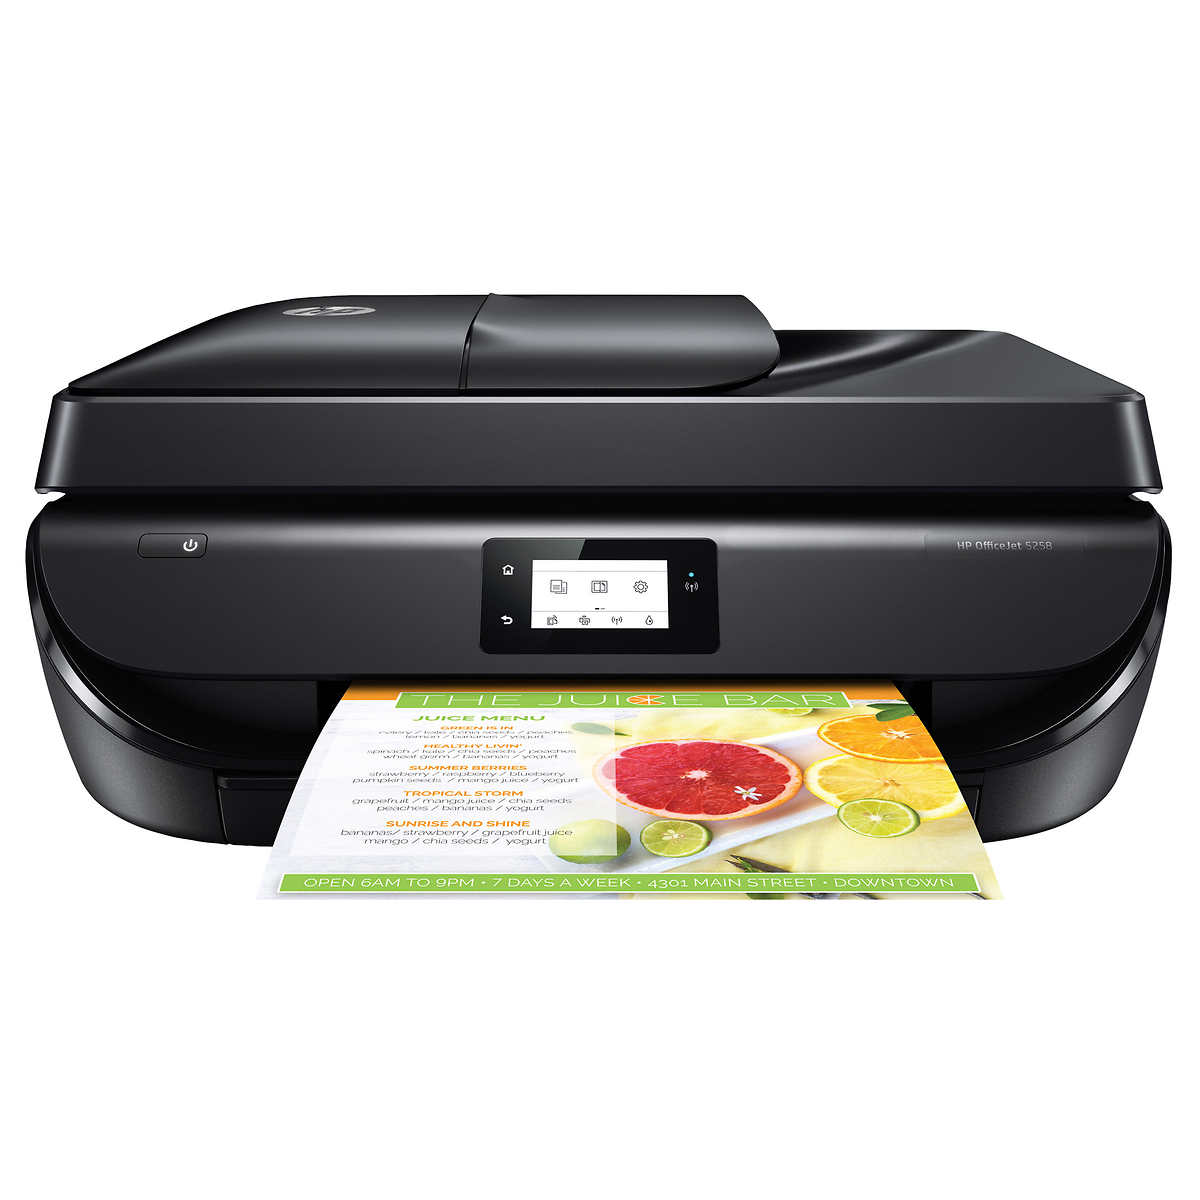 Hp Officejet 5258 All In One Wireless Printer